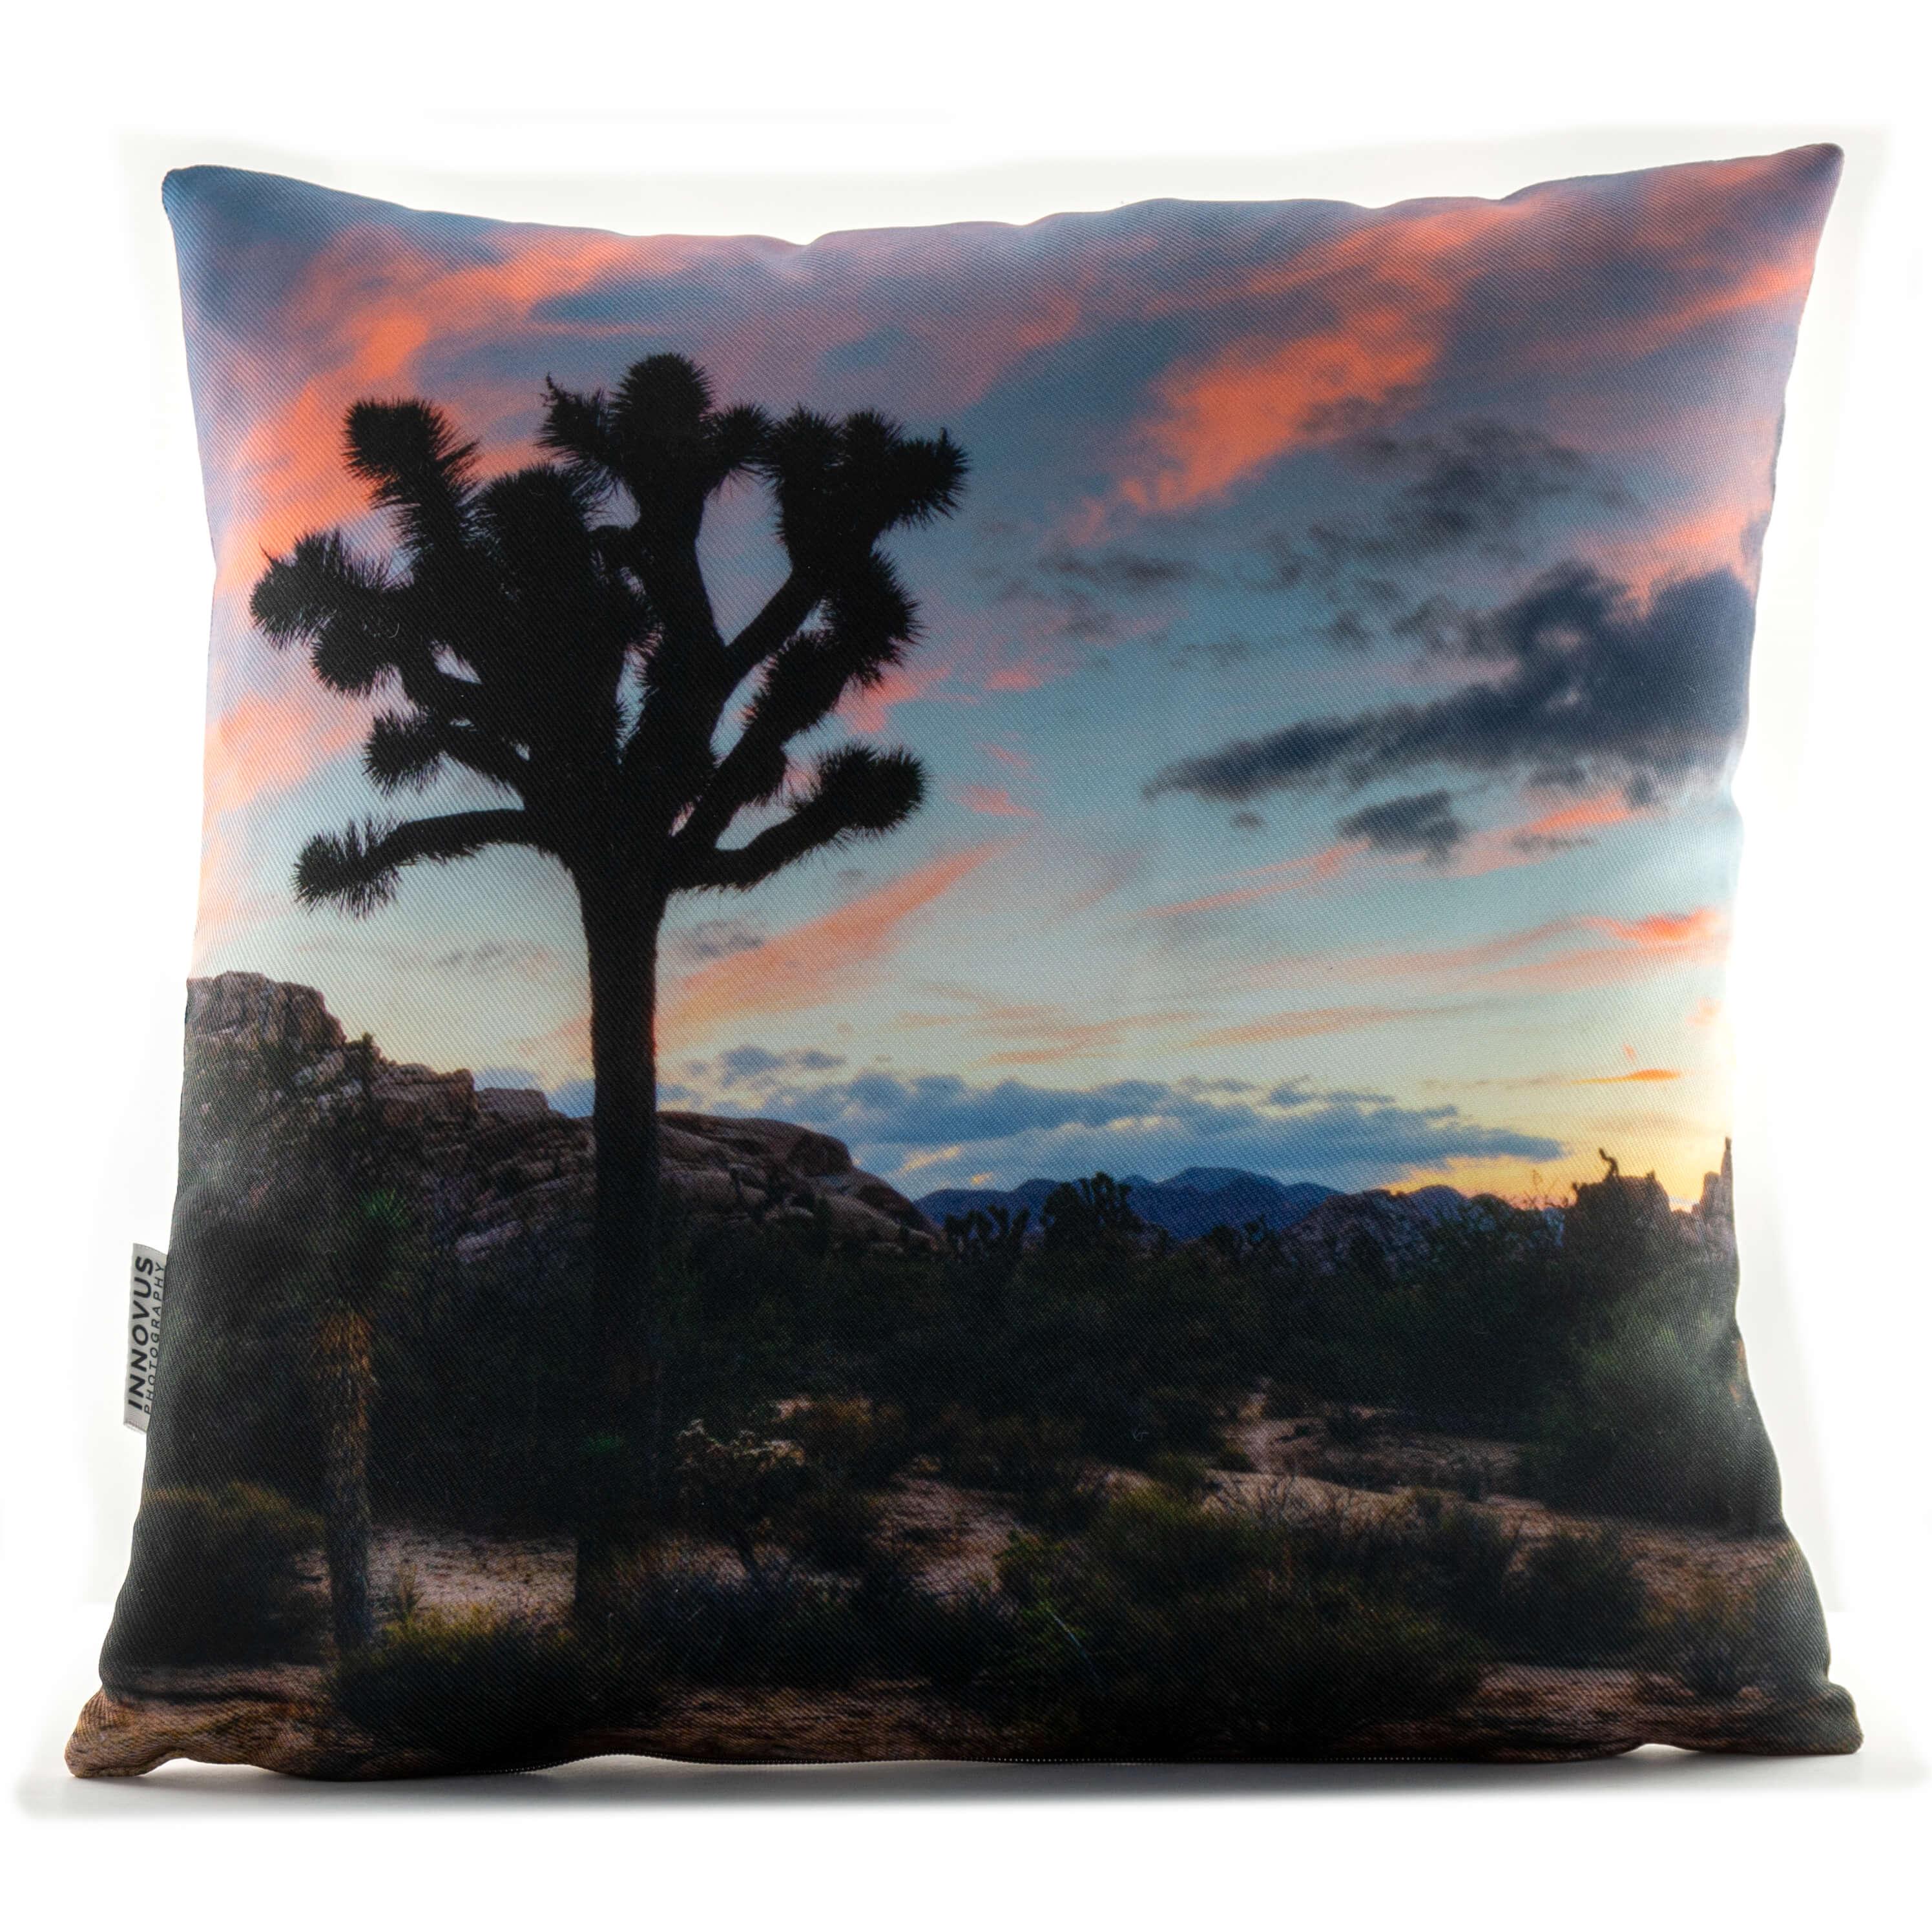 Pink Sunrise in Joshua Tree 14in Throw Pillow